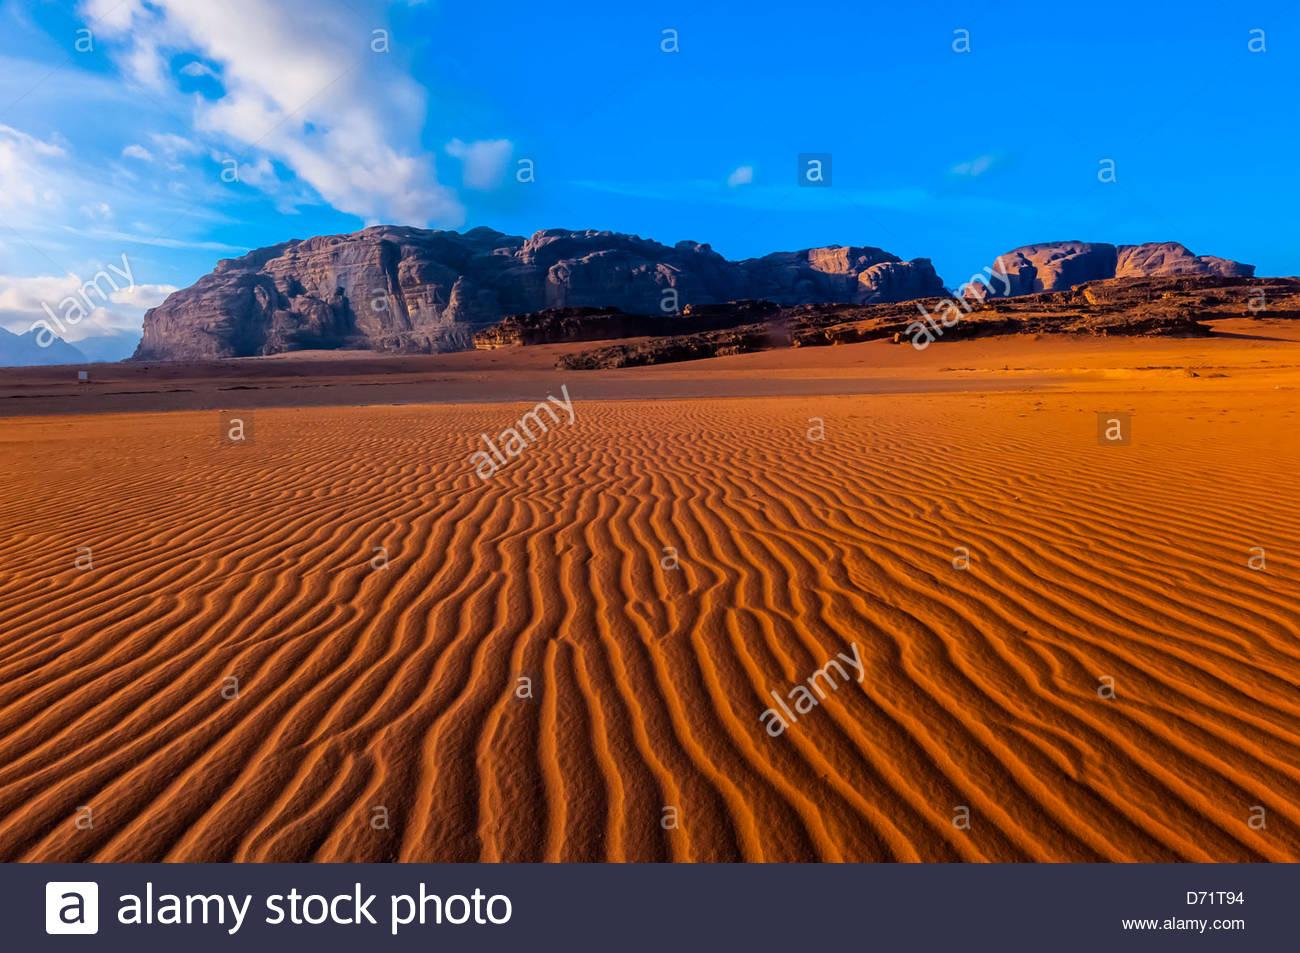 Desierto arábigo en Wadi Rum, Jordania. Imagen De Stock